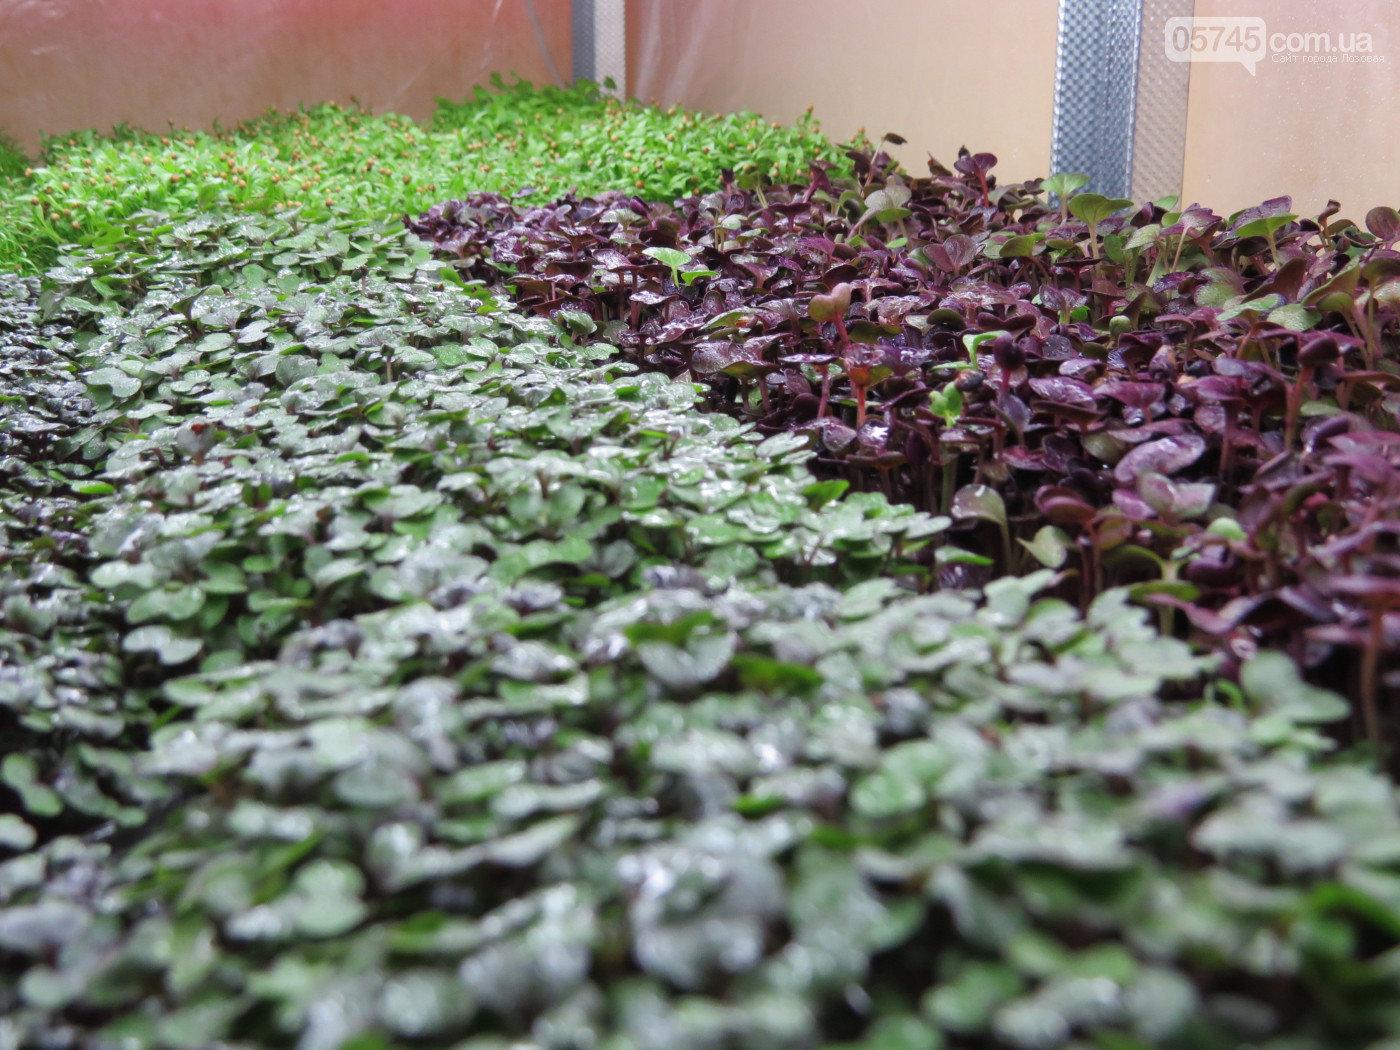 Вкусно, красиво, полезно: лозовчанка Елена Балахнина выращивает микрозелень, фото-3